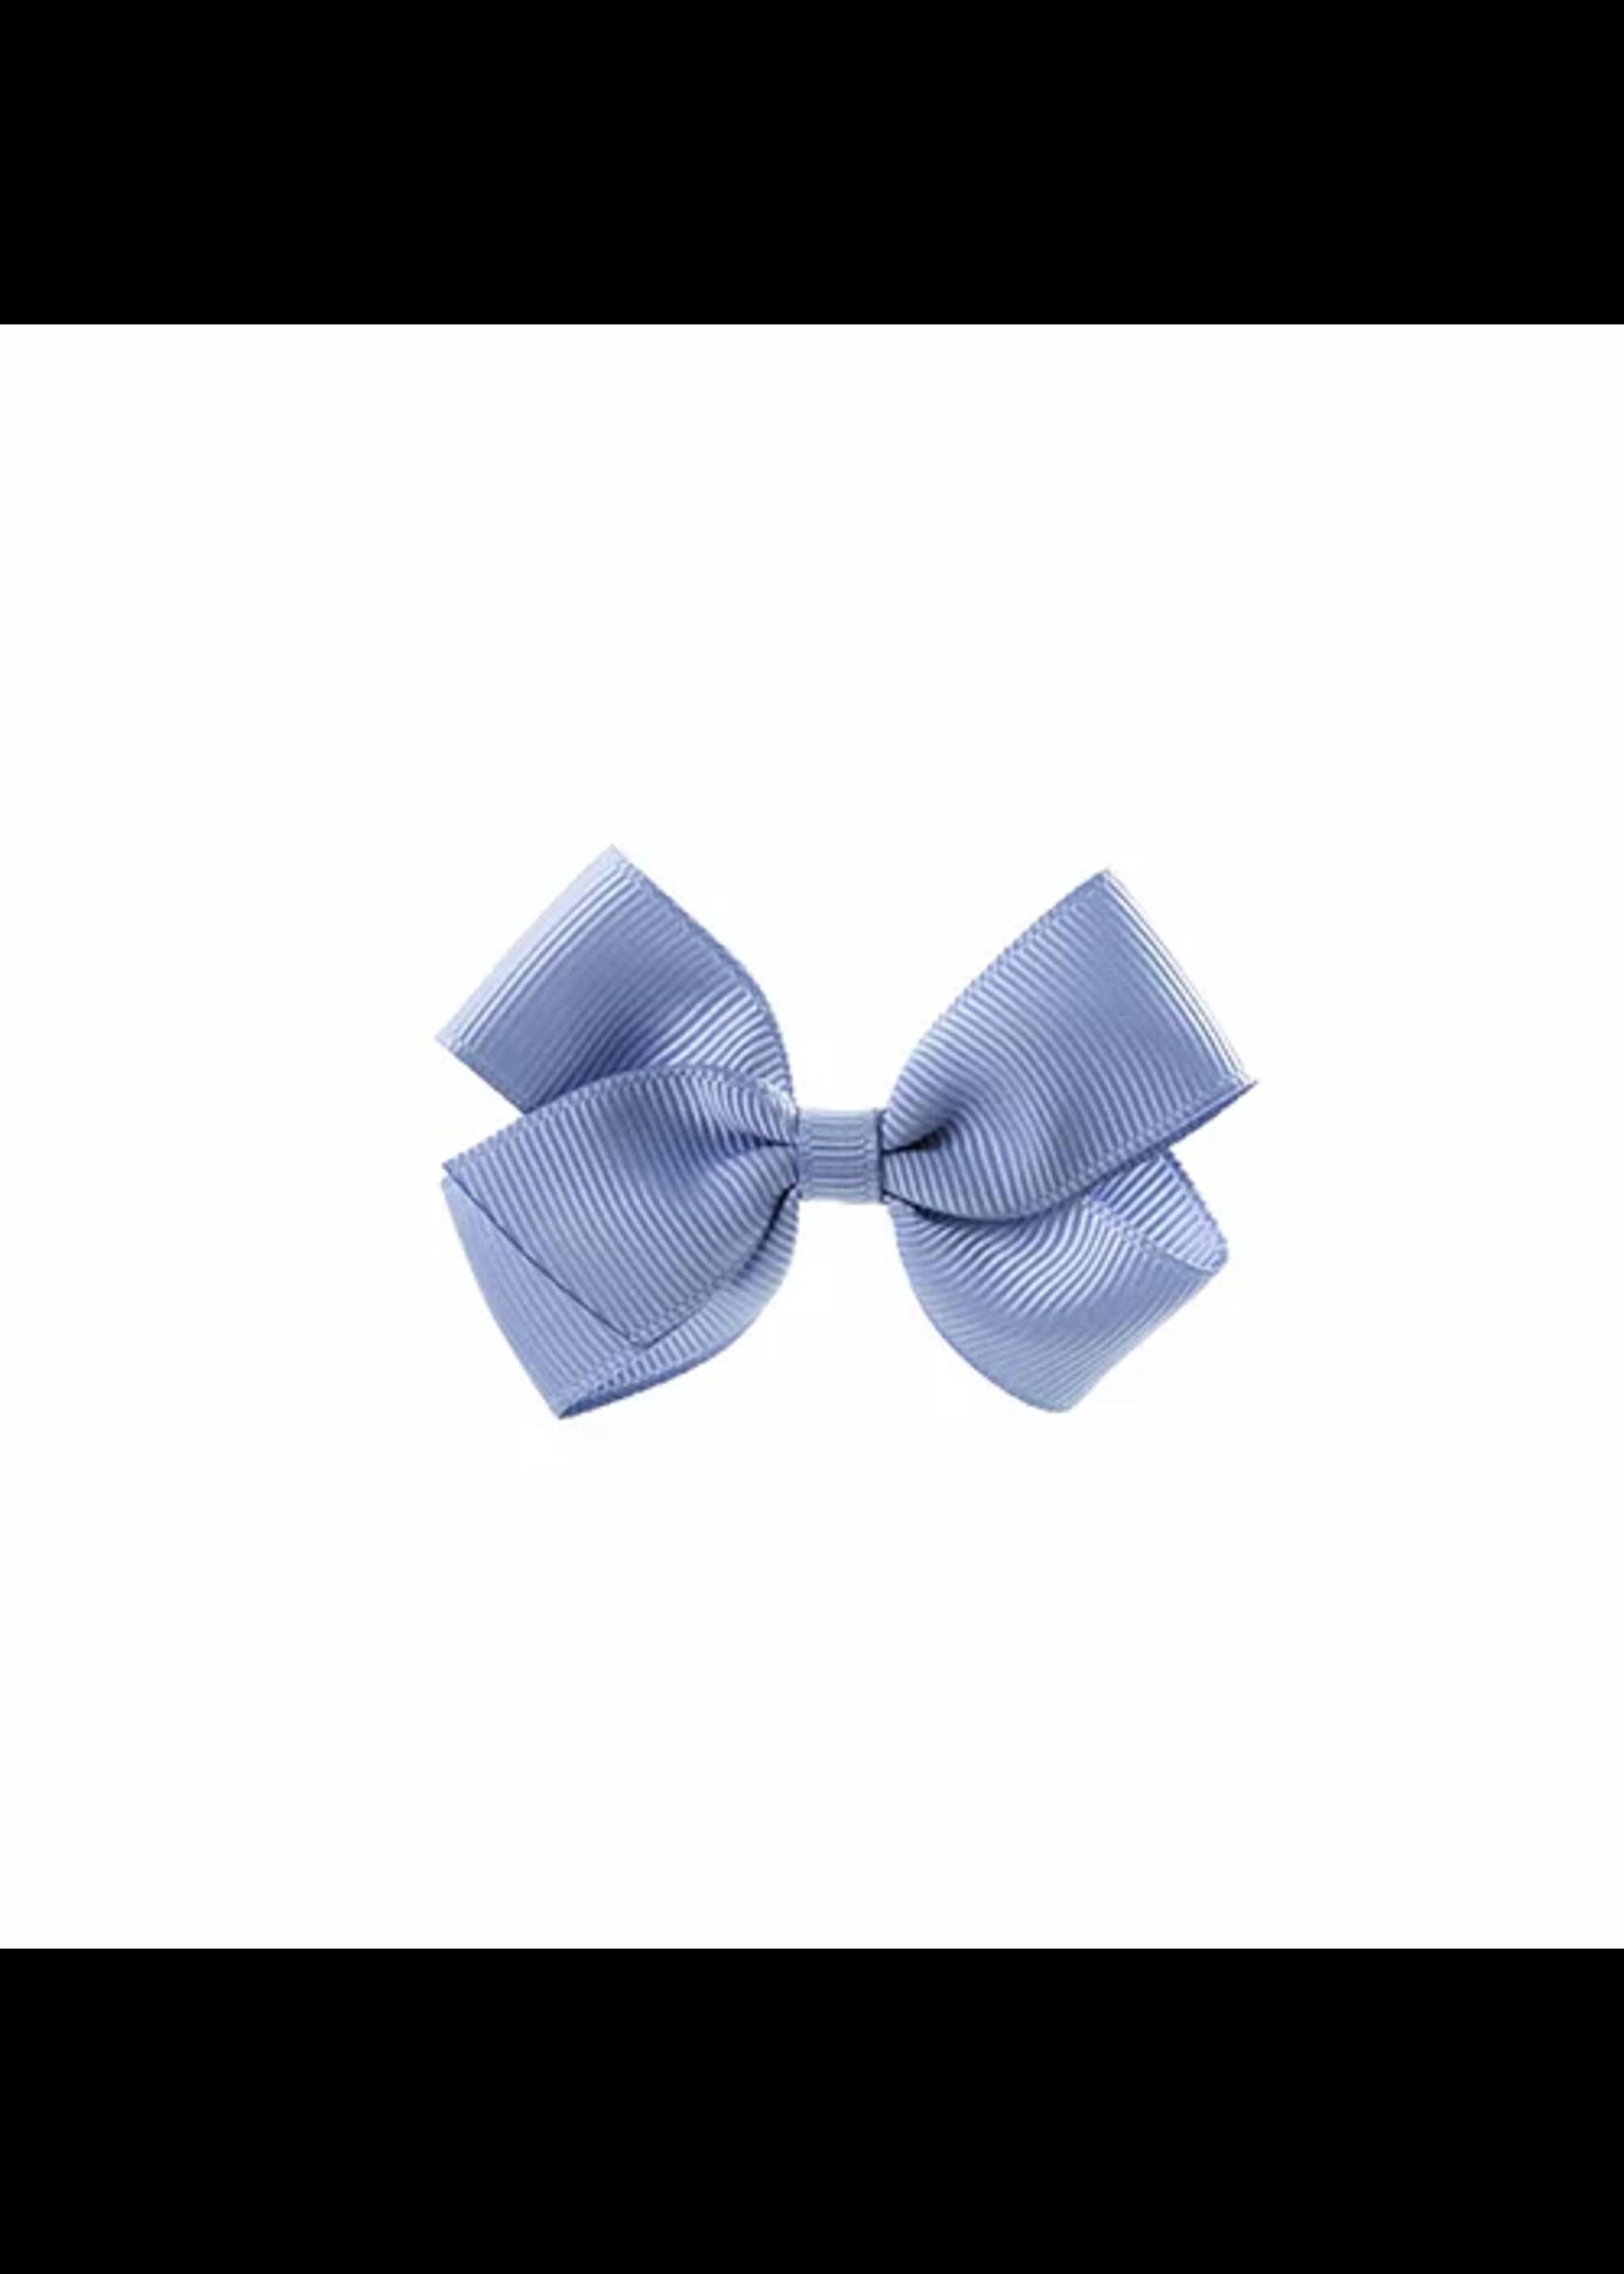 olilia Olilia Small London Bow (French Blue)